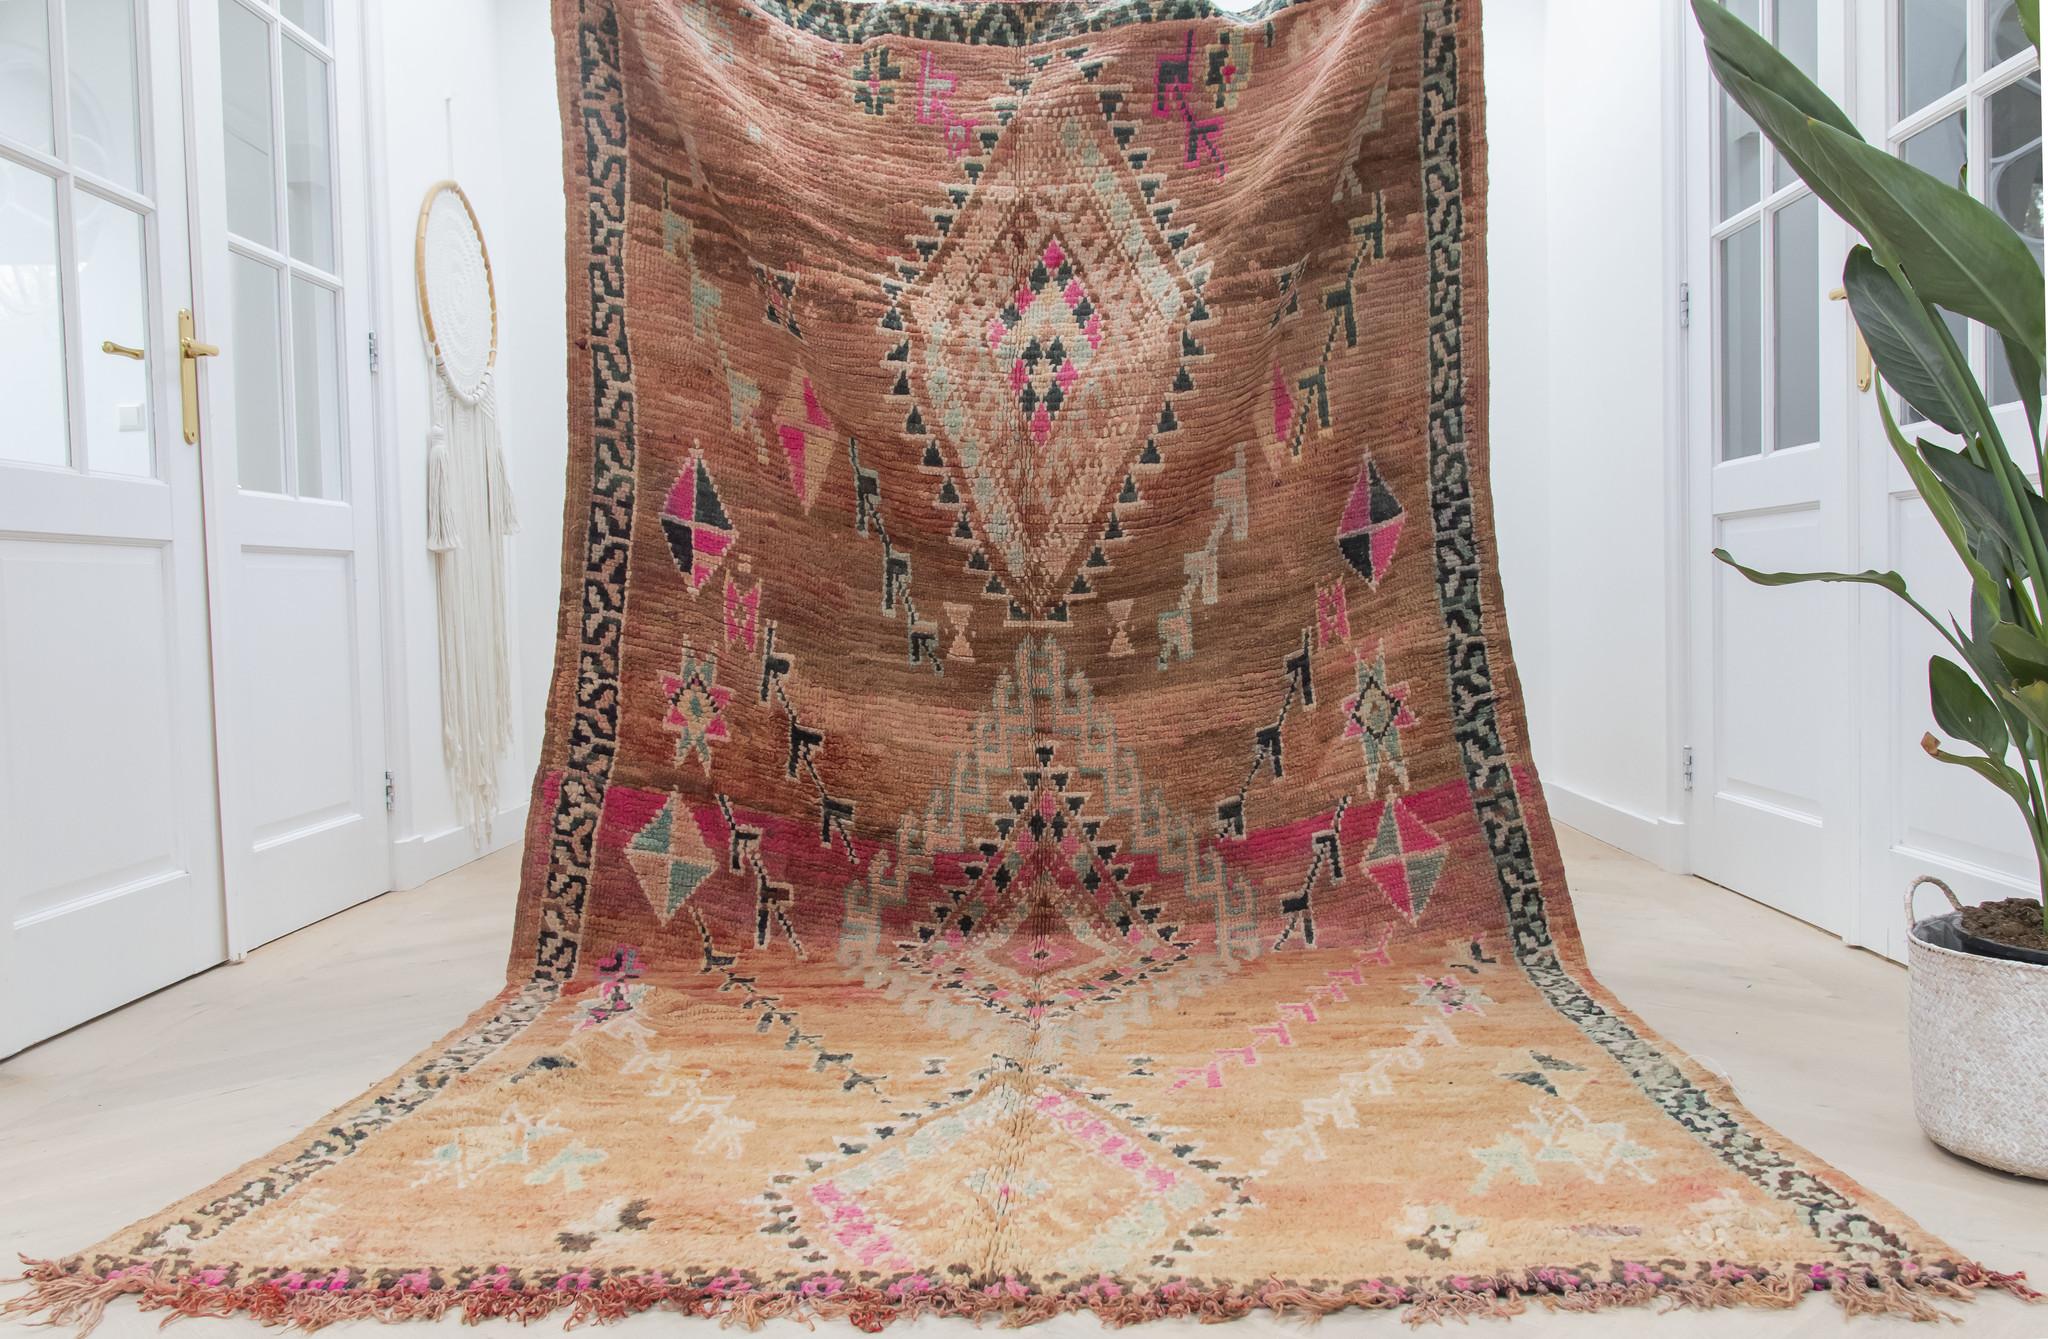 Simply Pure Handgefertigter Vintage Boujaad Berber-Teppich aus Marokko 173 x 320 cm